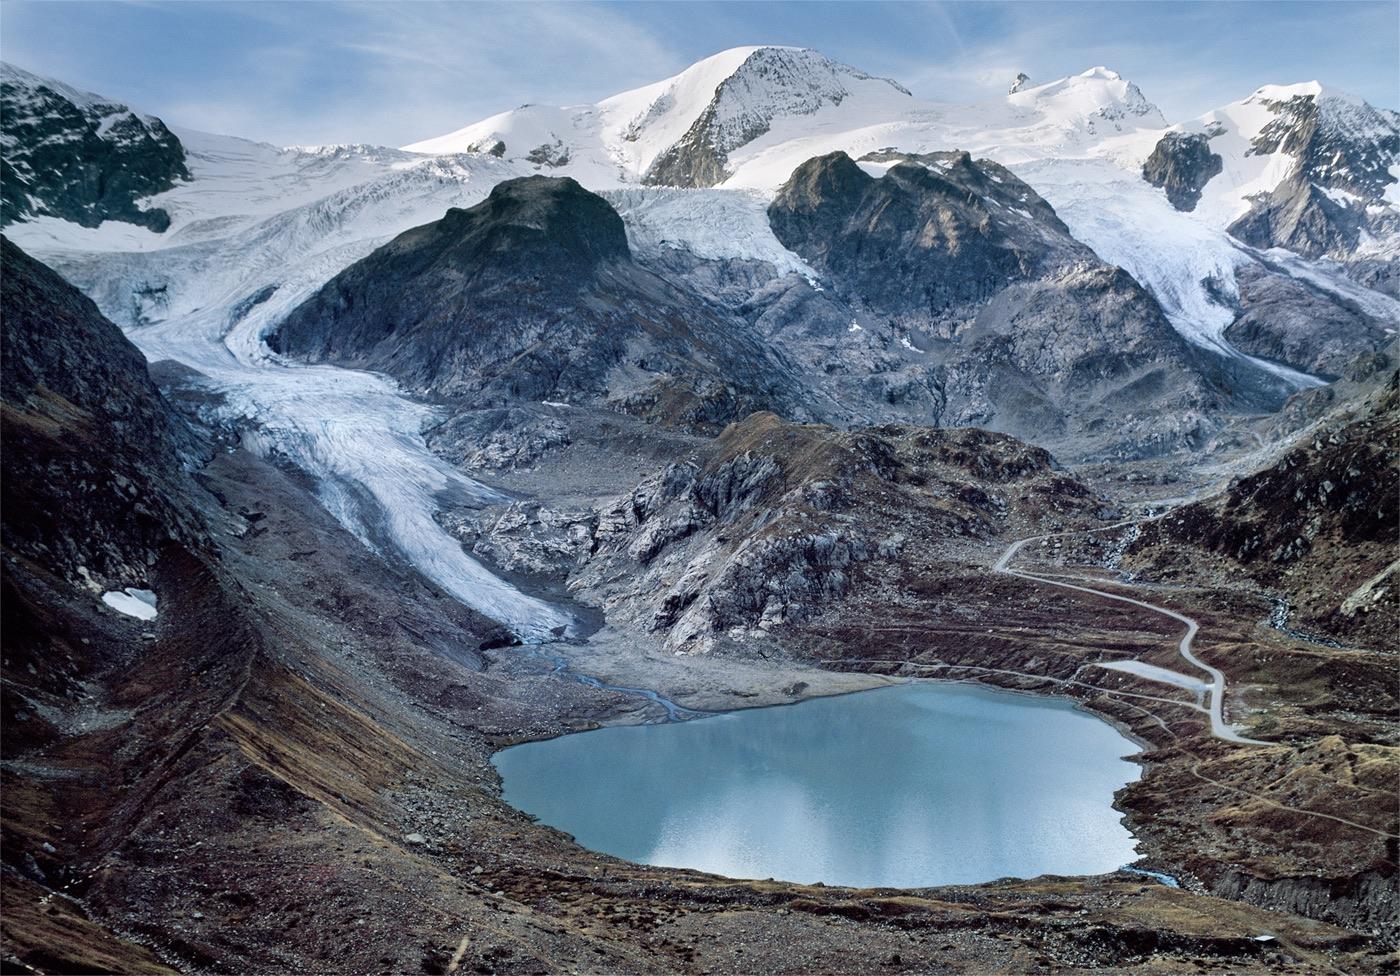 "Stein Glacier 9-17-2011 seen from EIS ""Stein 2"" position 2011 50-point average GPS position:  N 46 deg 43' 52.9"" E 8 deg. 26' 13.6"" Elev. 6829'"